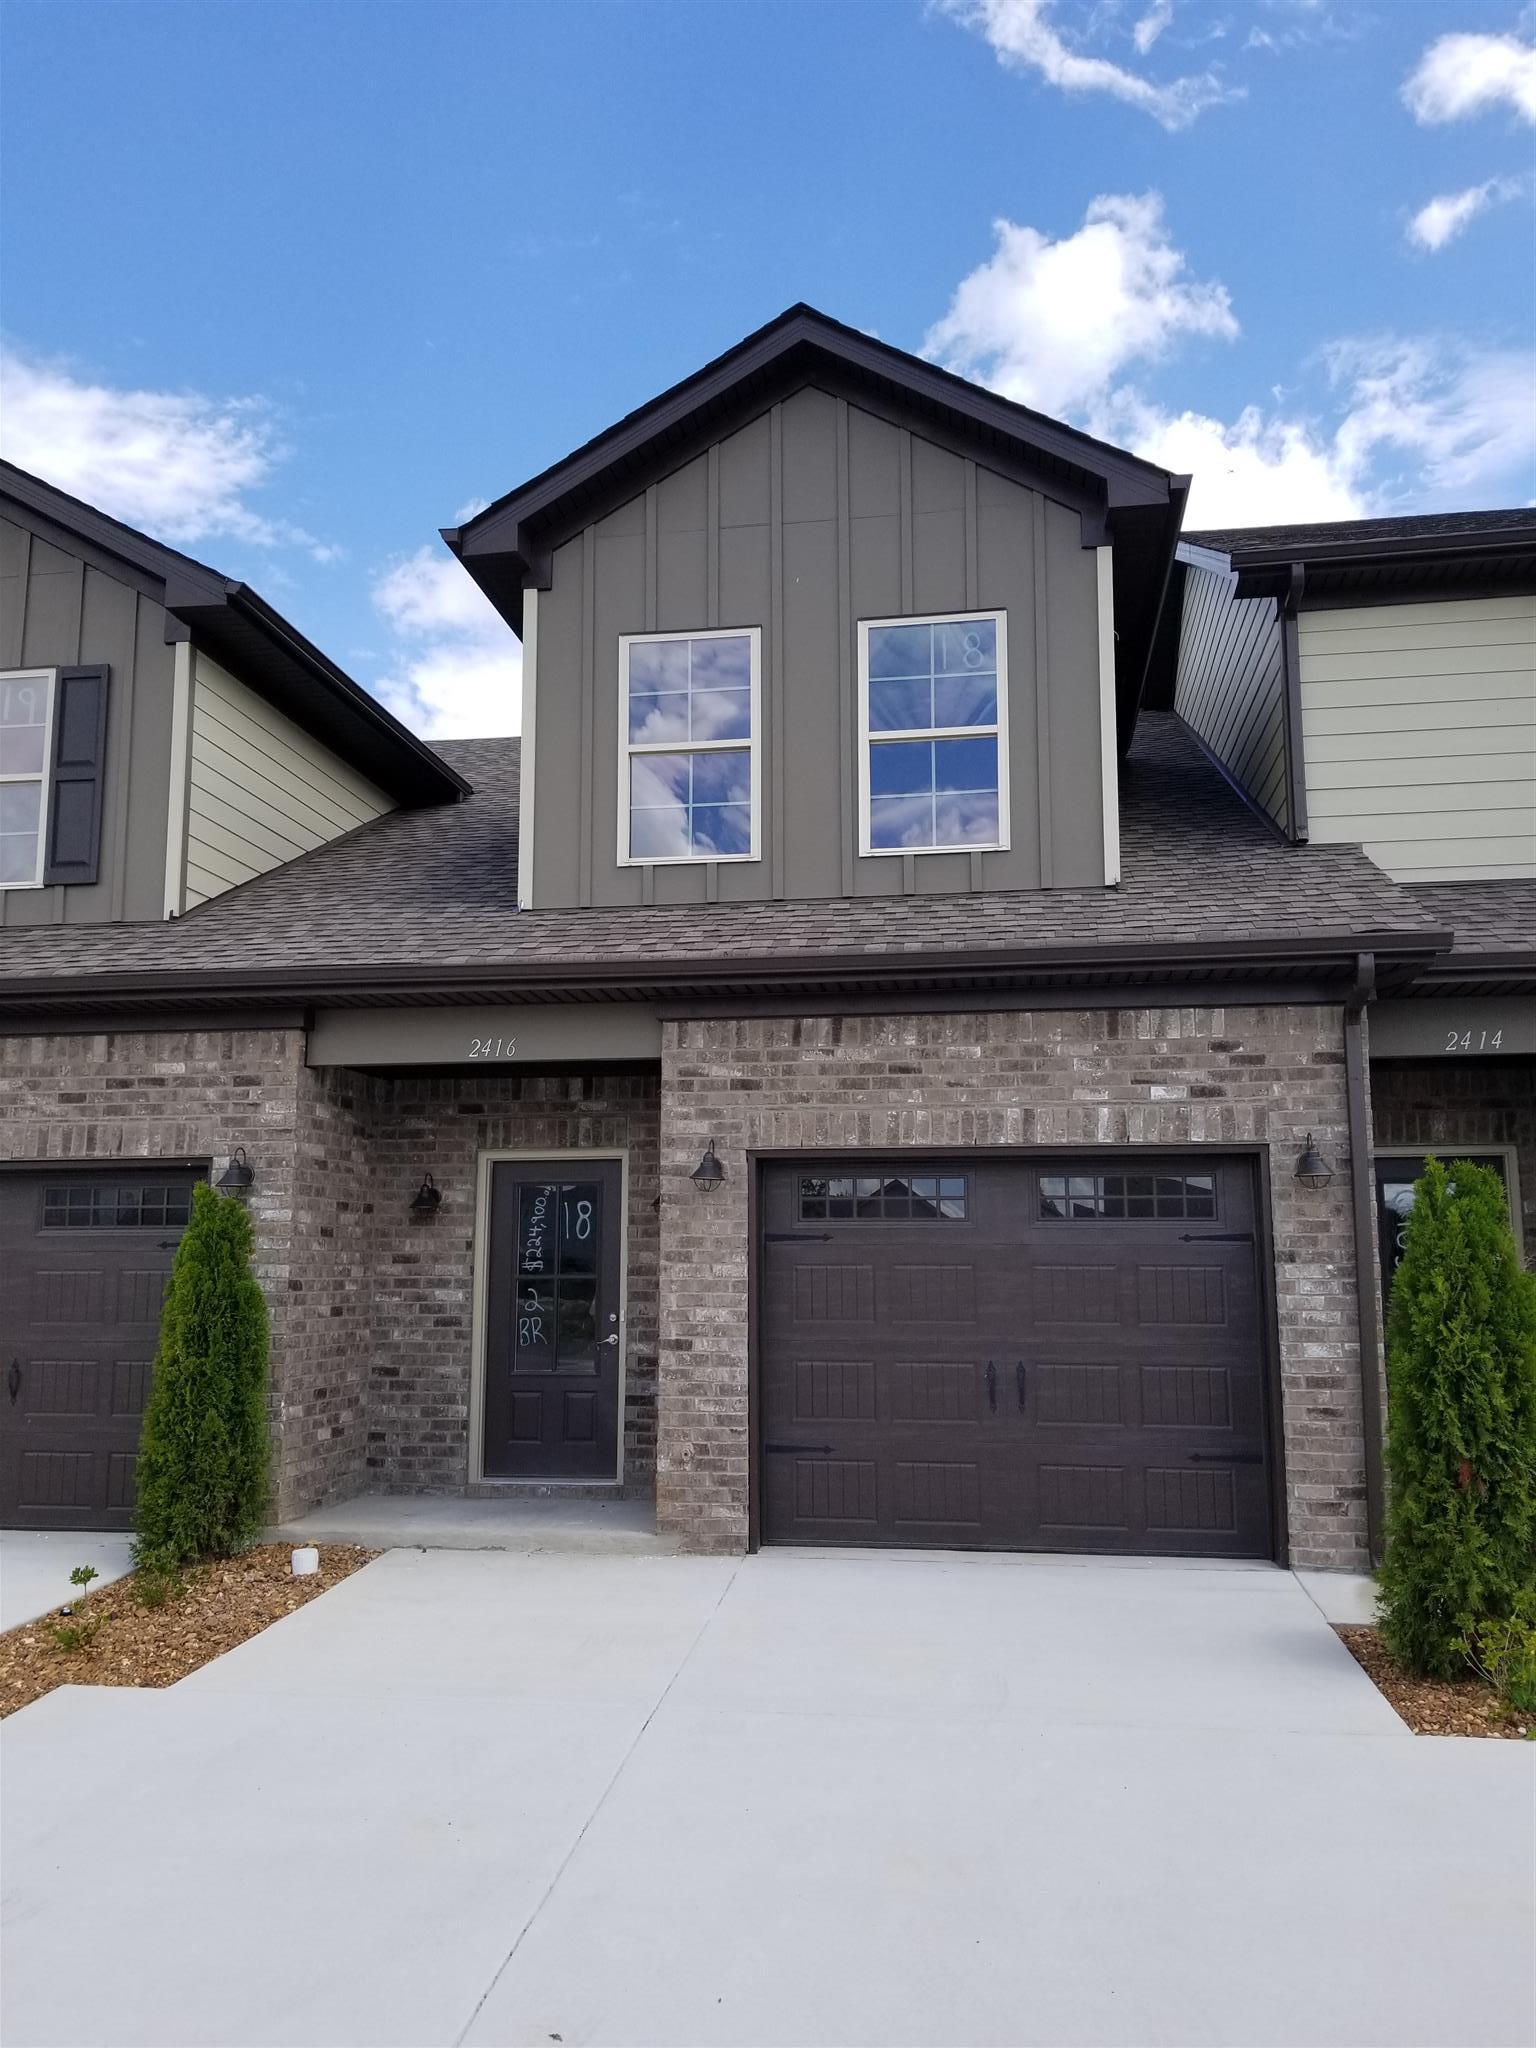 2416 Lightbend Dr - Lot 18, Murfreesboro, TN 37127 - Murfreesboro, TN real estate listing